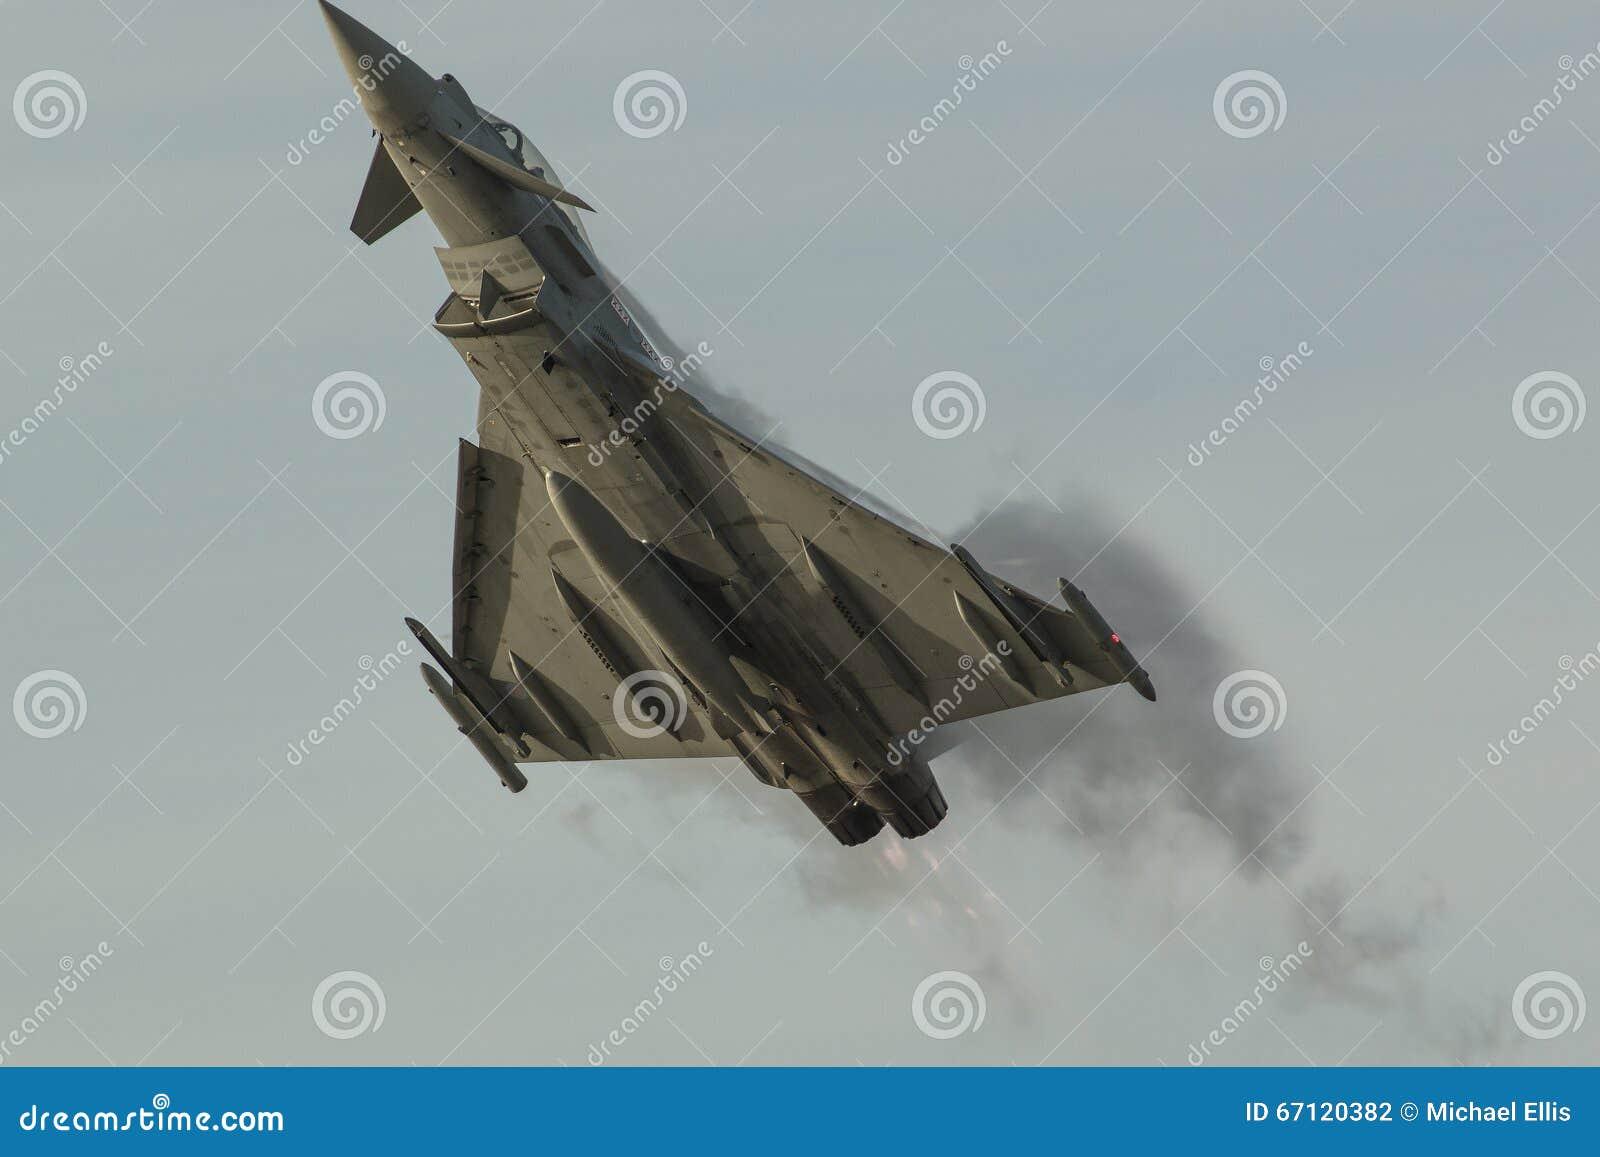 BAe Typhoon - 04 stock photo  Image of southport, plane - 67120382